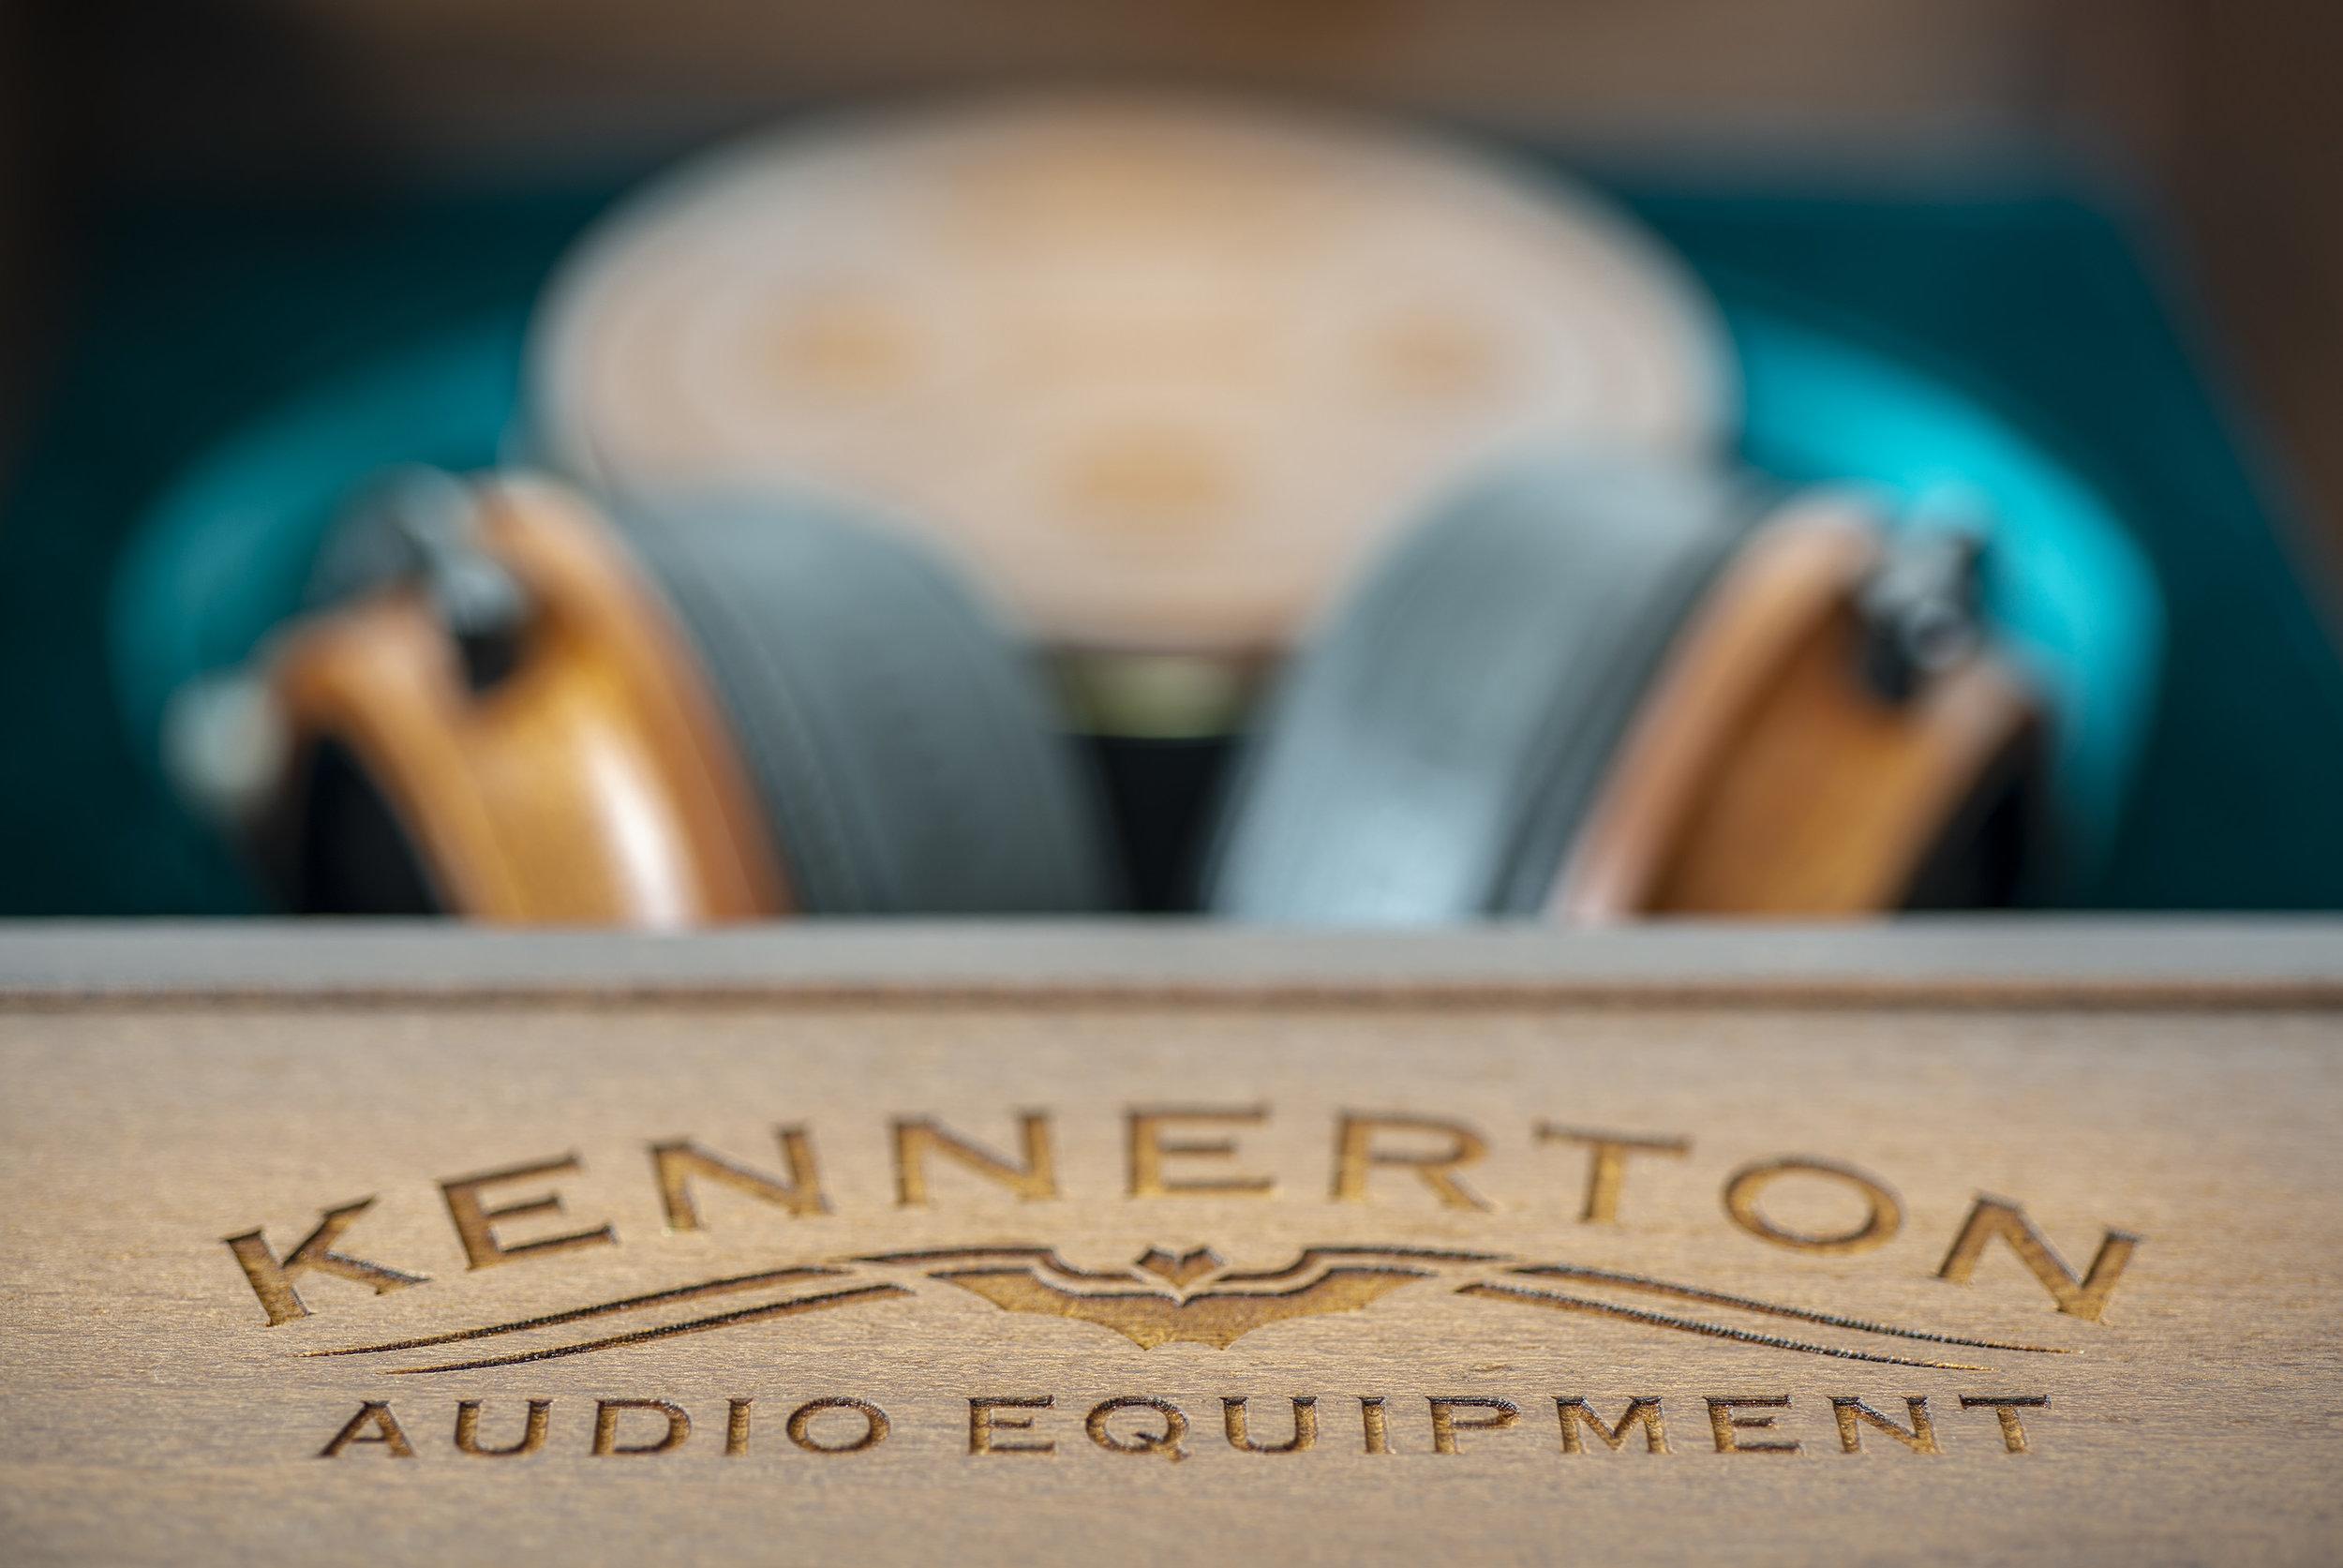 KENNERTON ODIN HEADPHONES